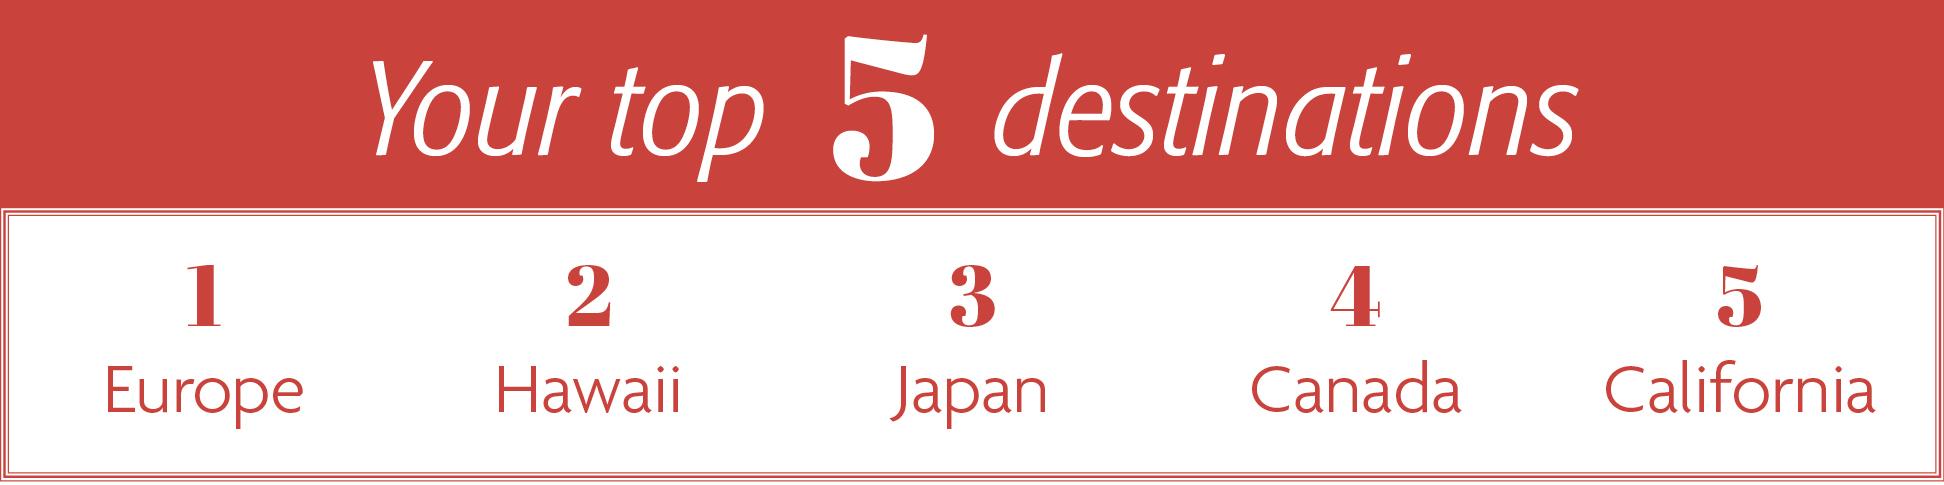 Your top 5 destinations - 1. Europe 2. Hawaii 3. Japan 4. Canada 5. California